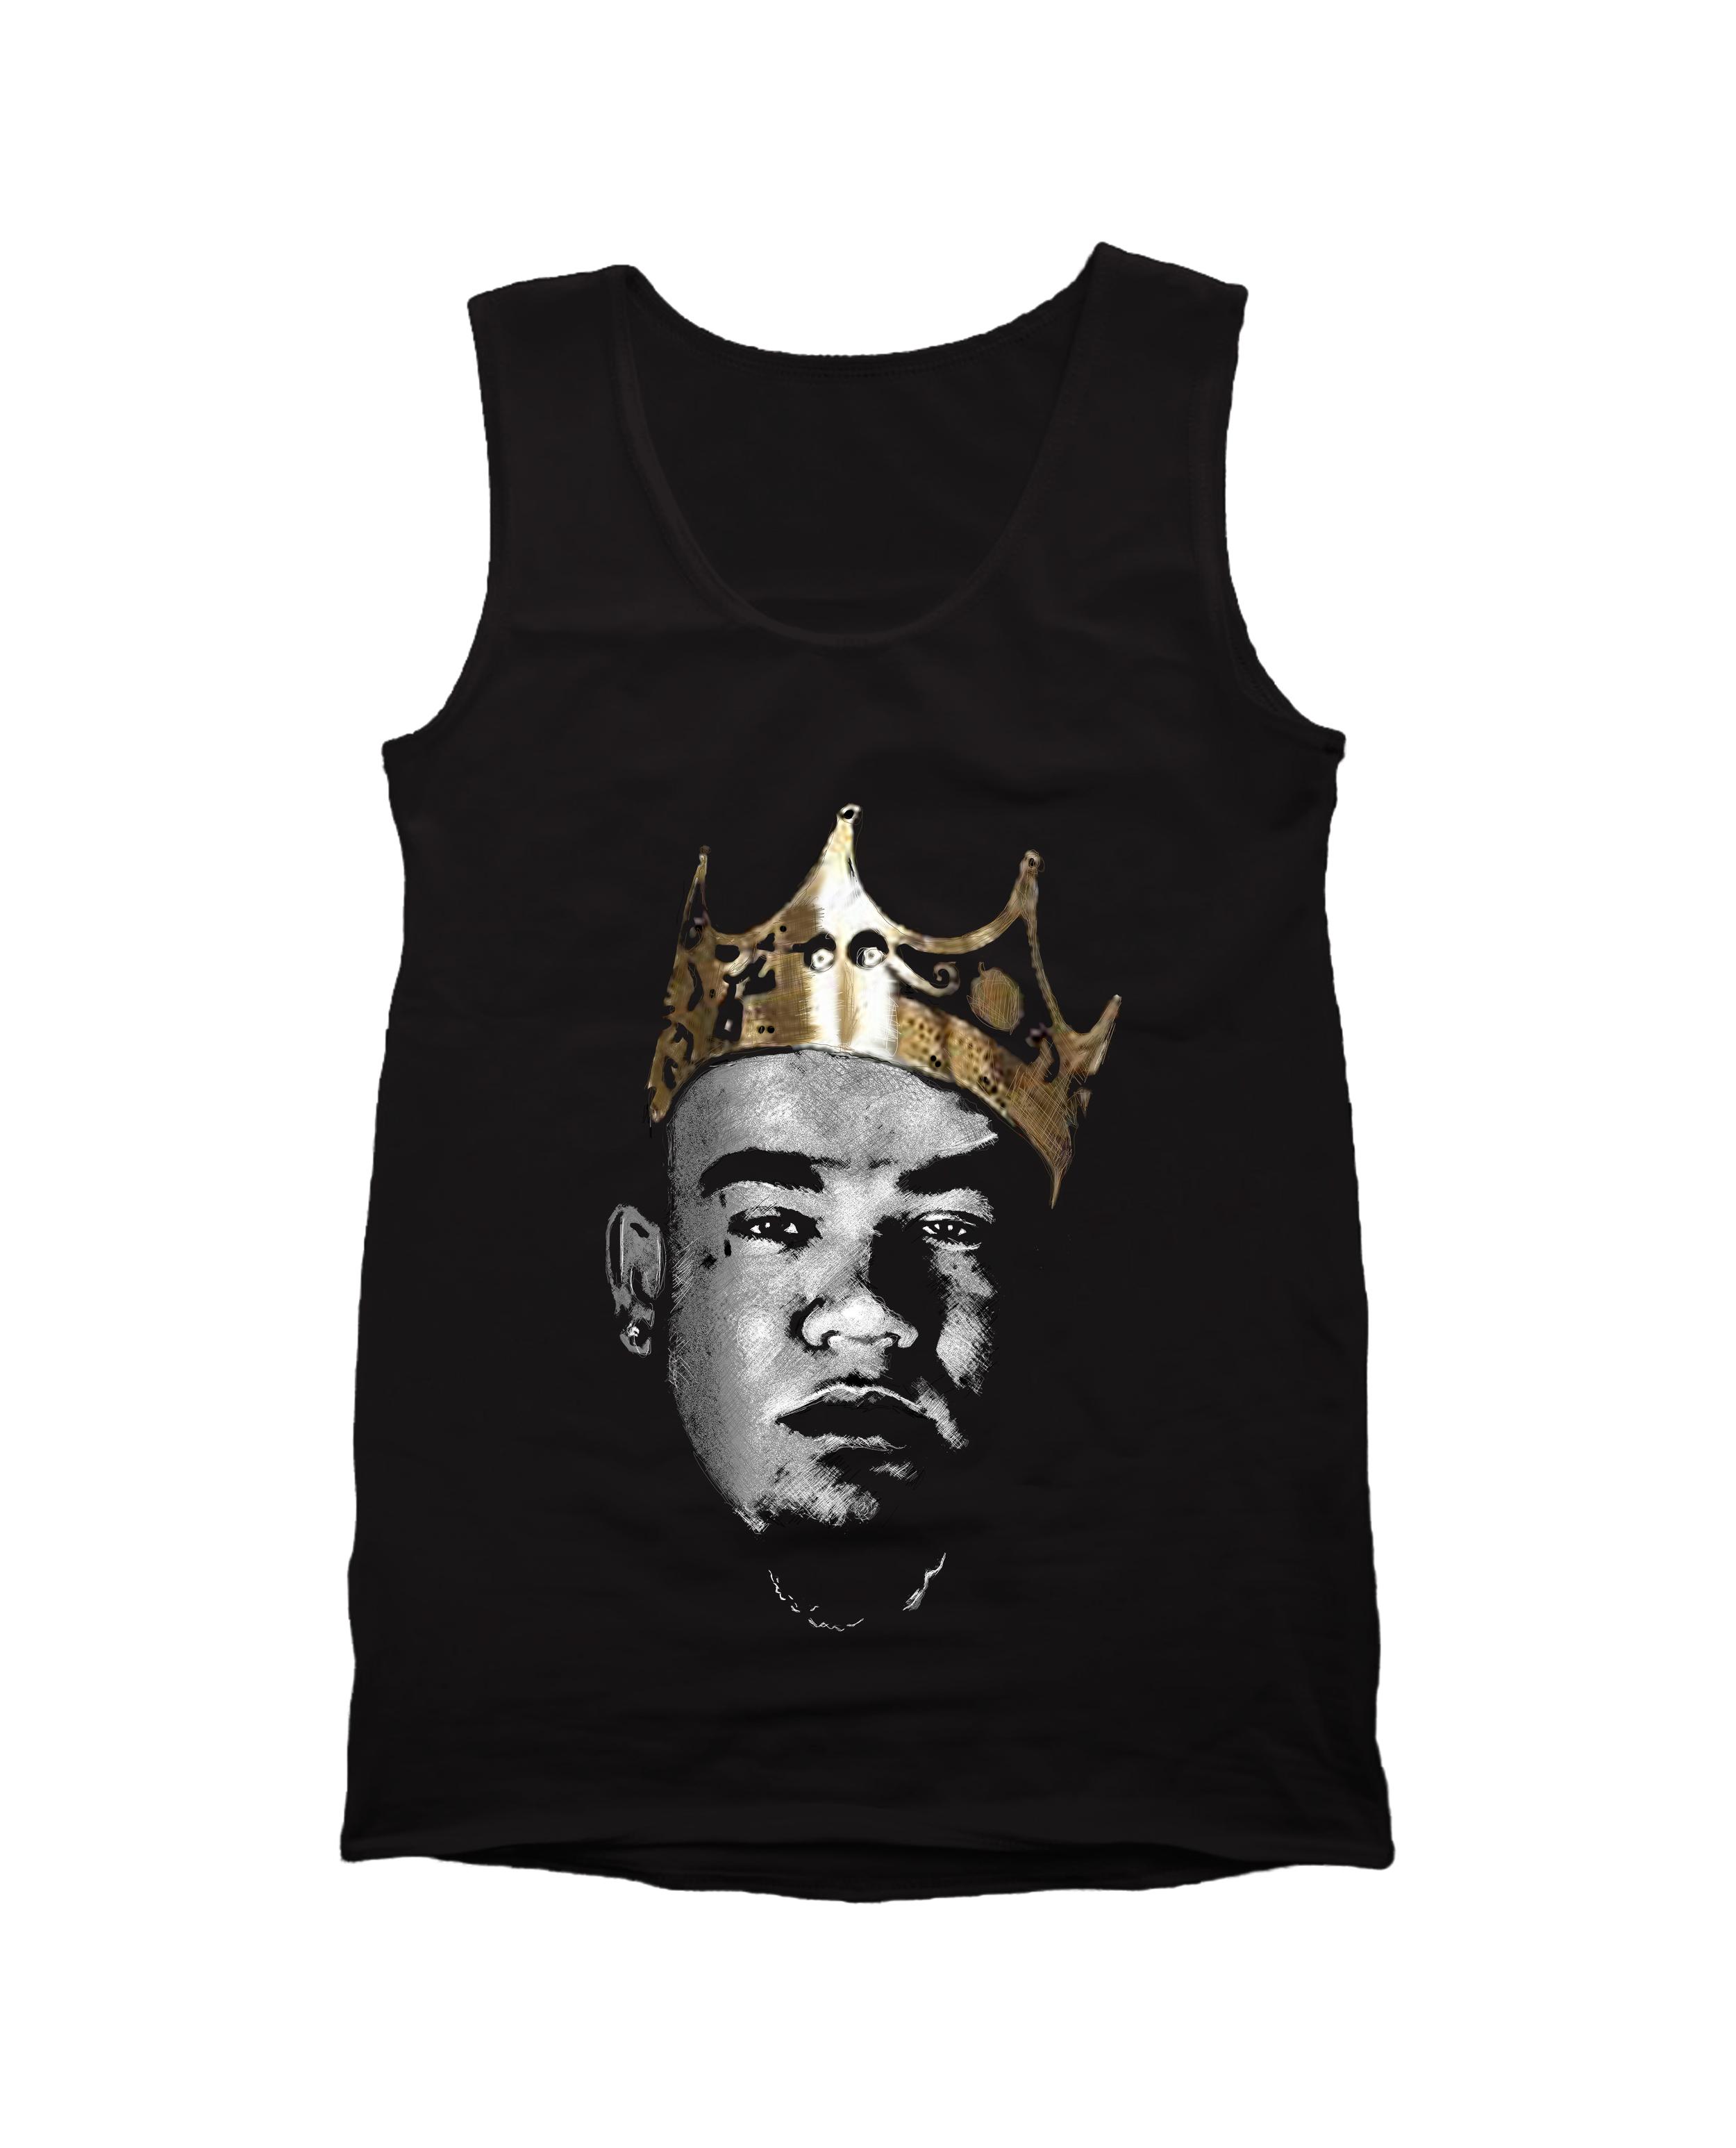 Notorious KING black tee mock up _ use this.jpg